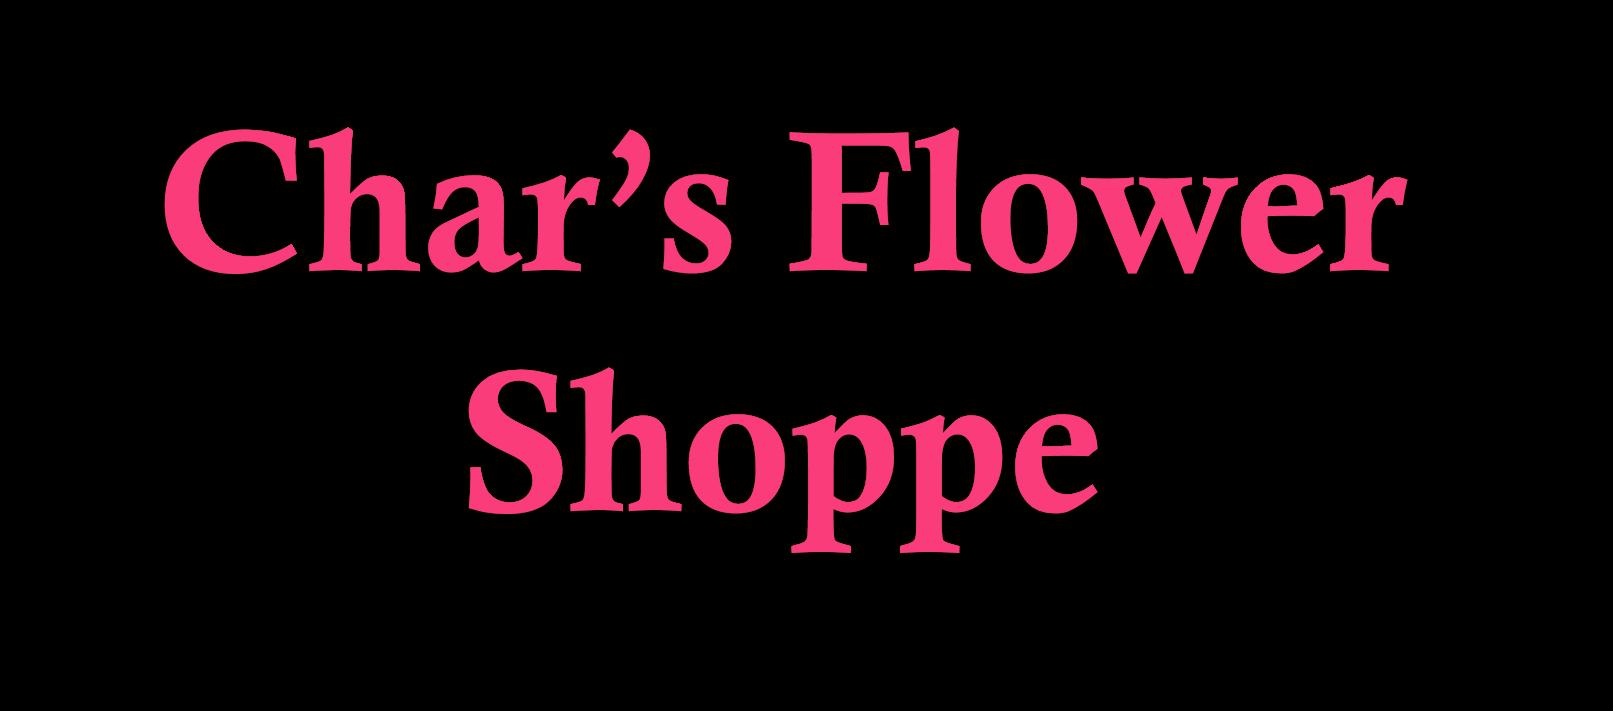 winter bouquets delivery warwick ri char u0027s flower shoppe